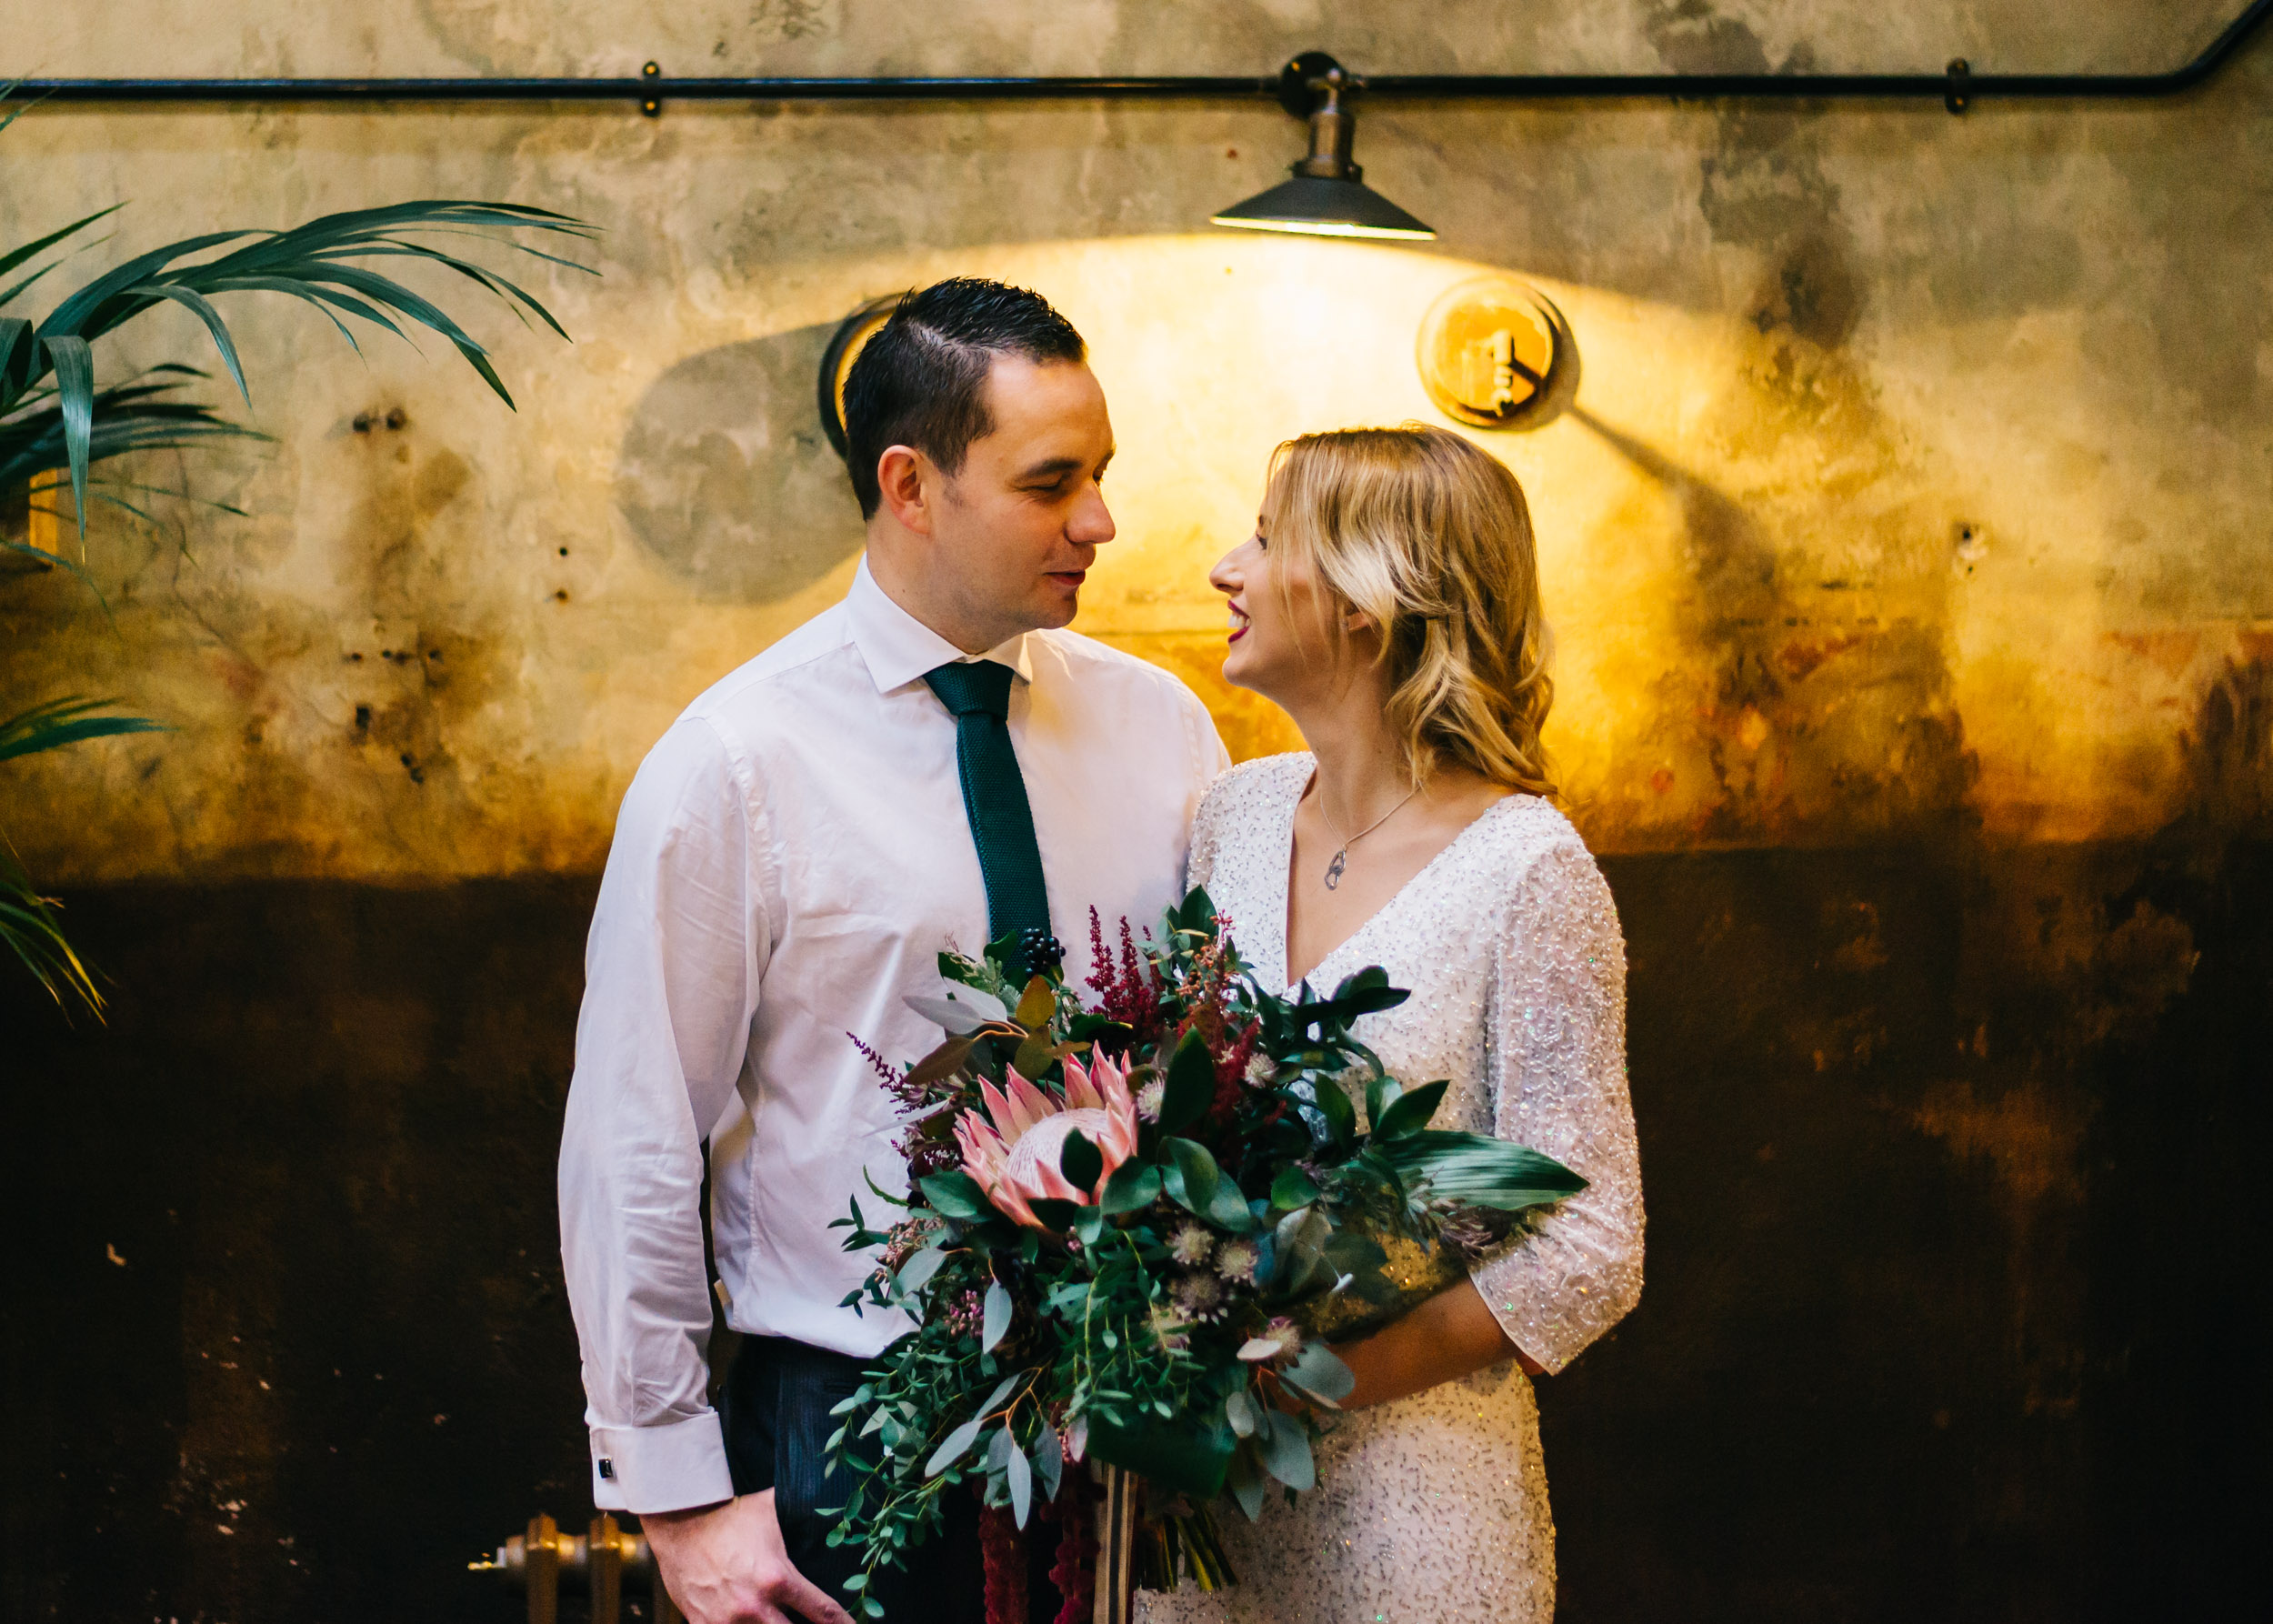 Holmes Mill, Clitheroe, Lancashire - Styled Wedding Shoot-2.jpg